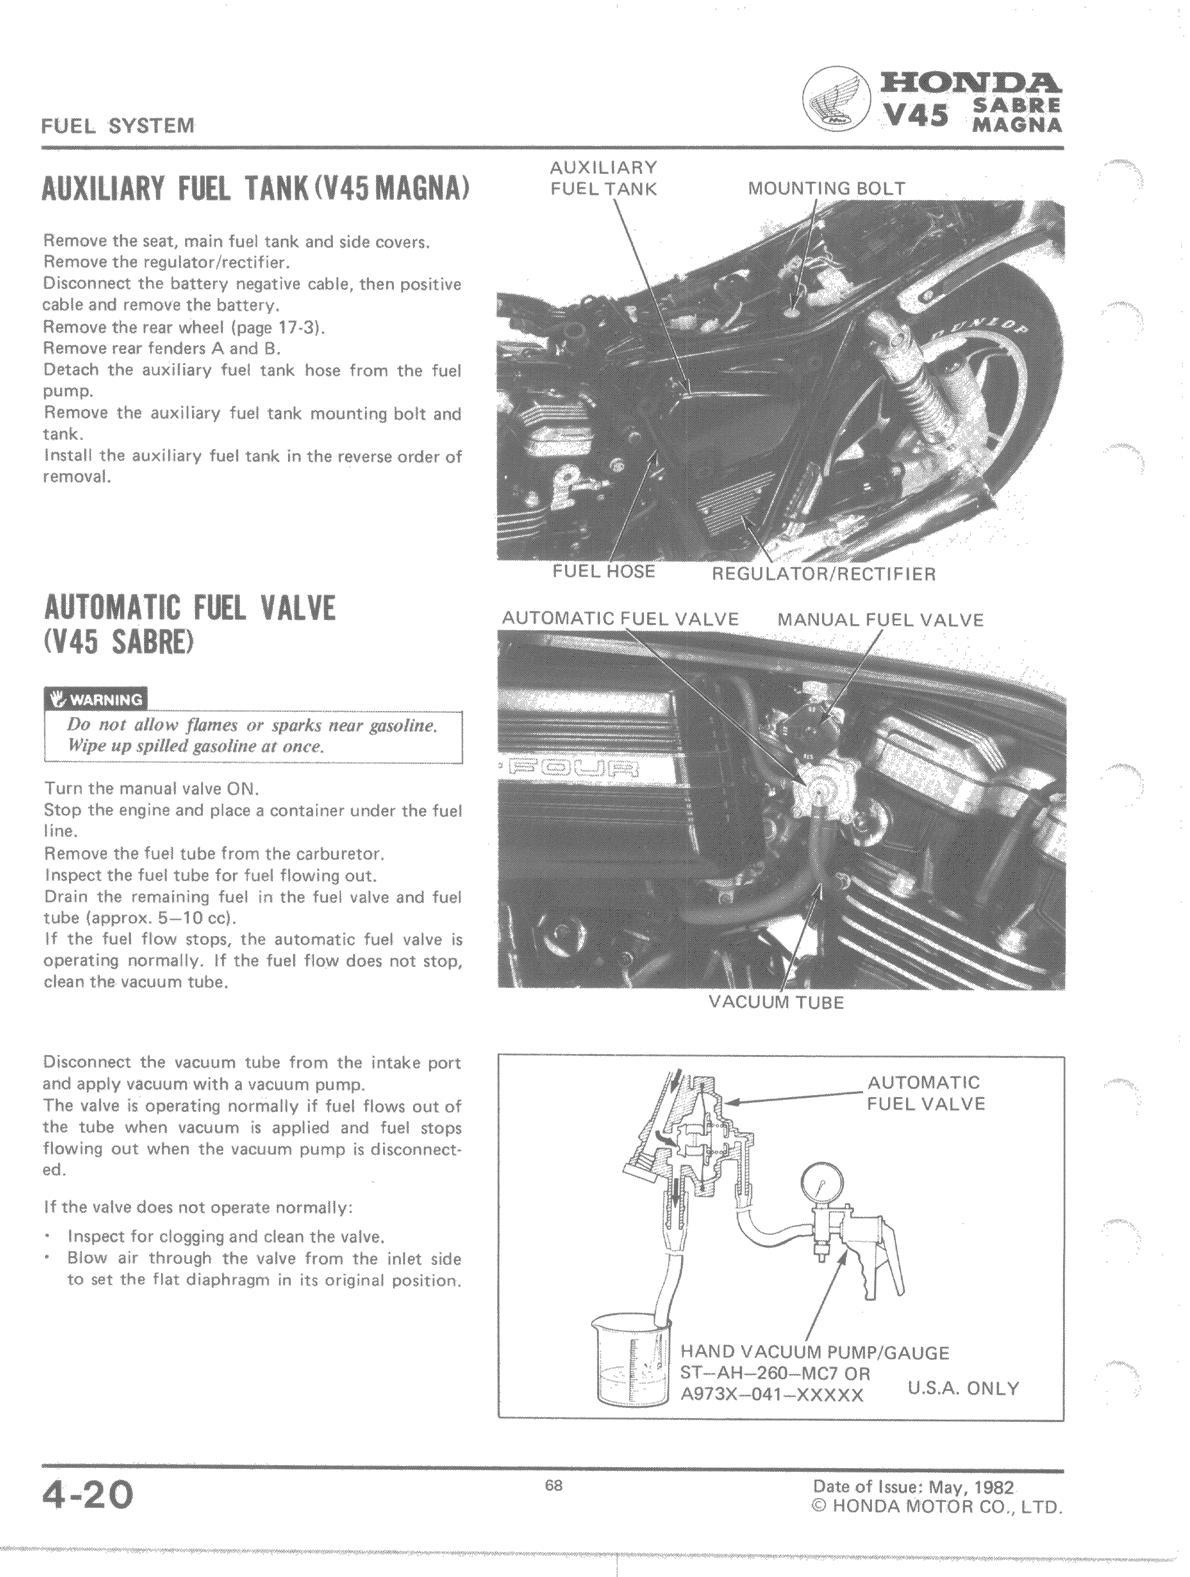 bass end ackwards honda v45 auxiliary fuel tank rh bassendackwards webstarts com 1982 honda v45 magna manual honda v65 magna owner's manual